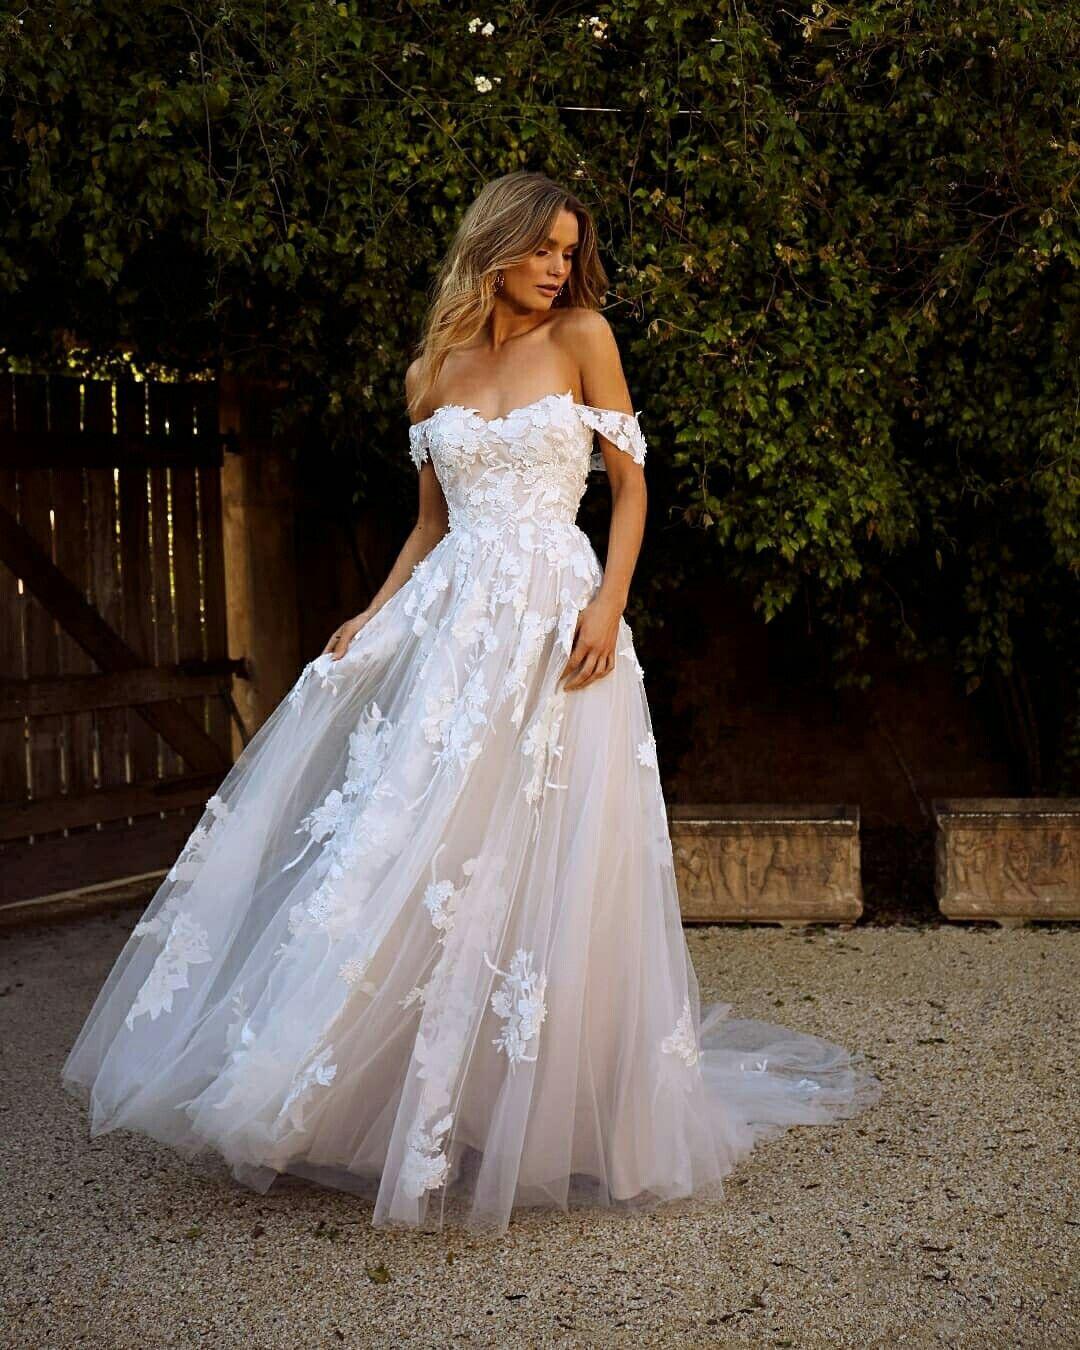 Pin by Julia P. on Wedding Ideas in 17  Bridal dresses, Wedding